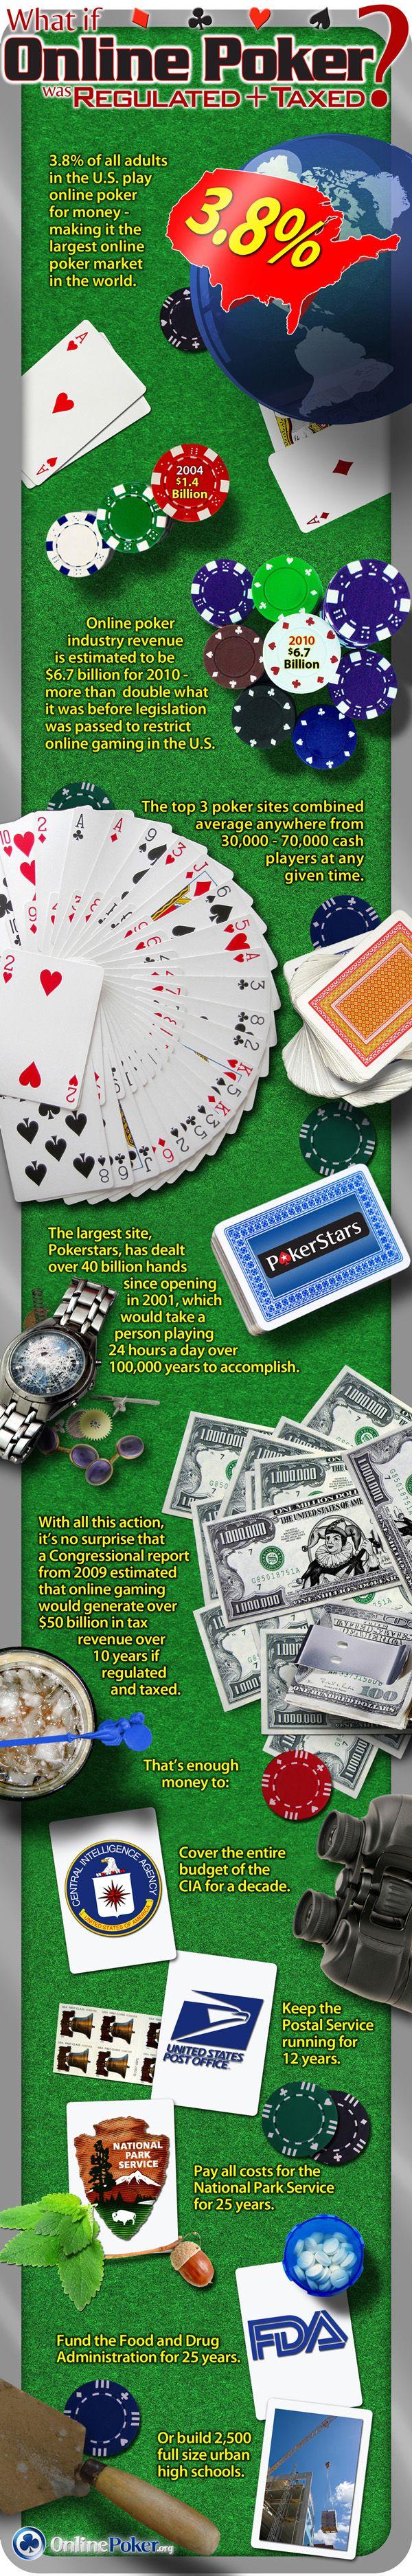 Casino Poker Rules And Regulations